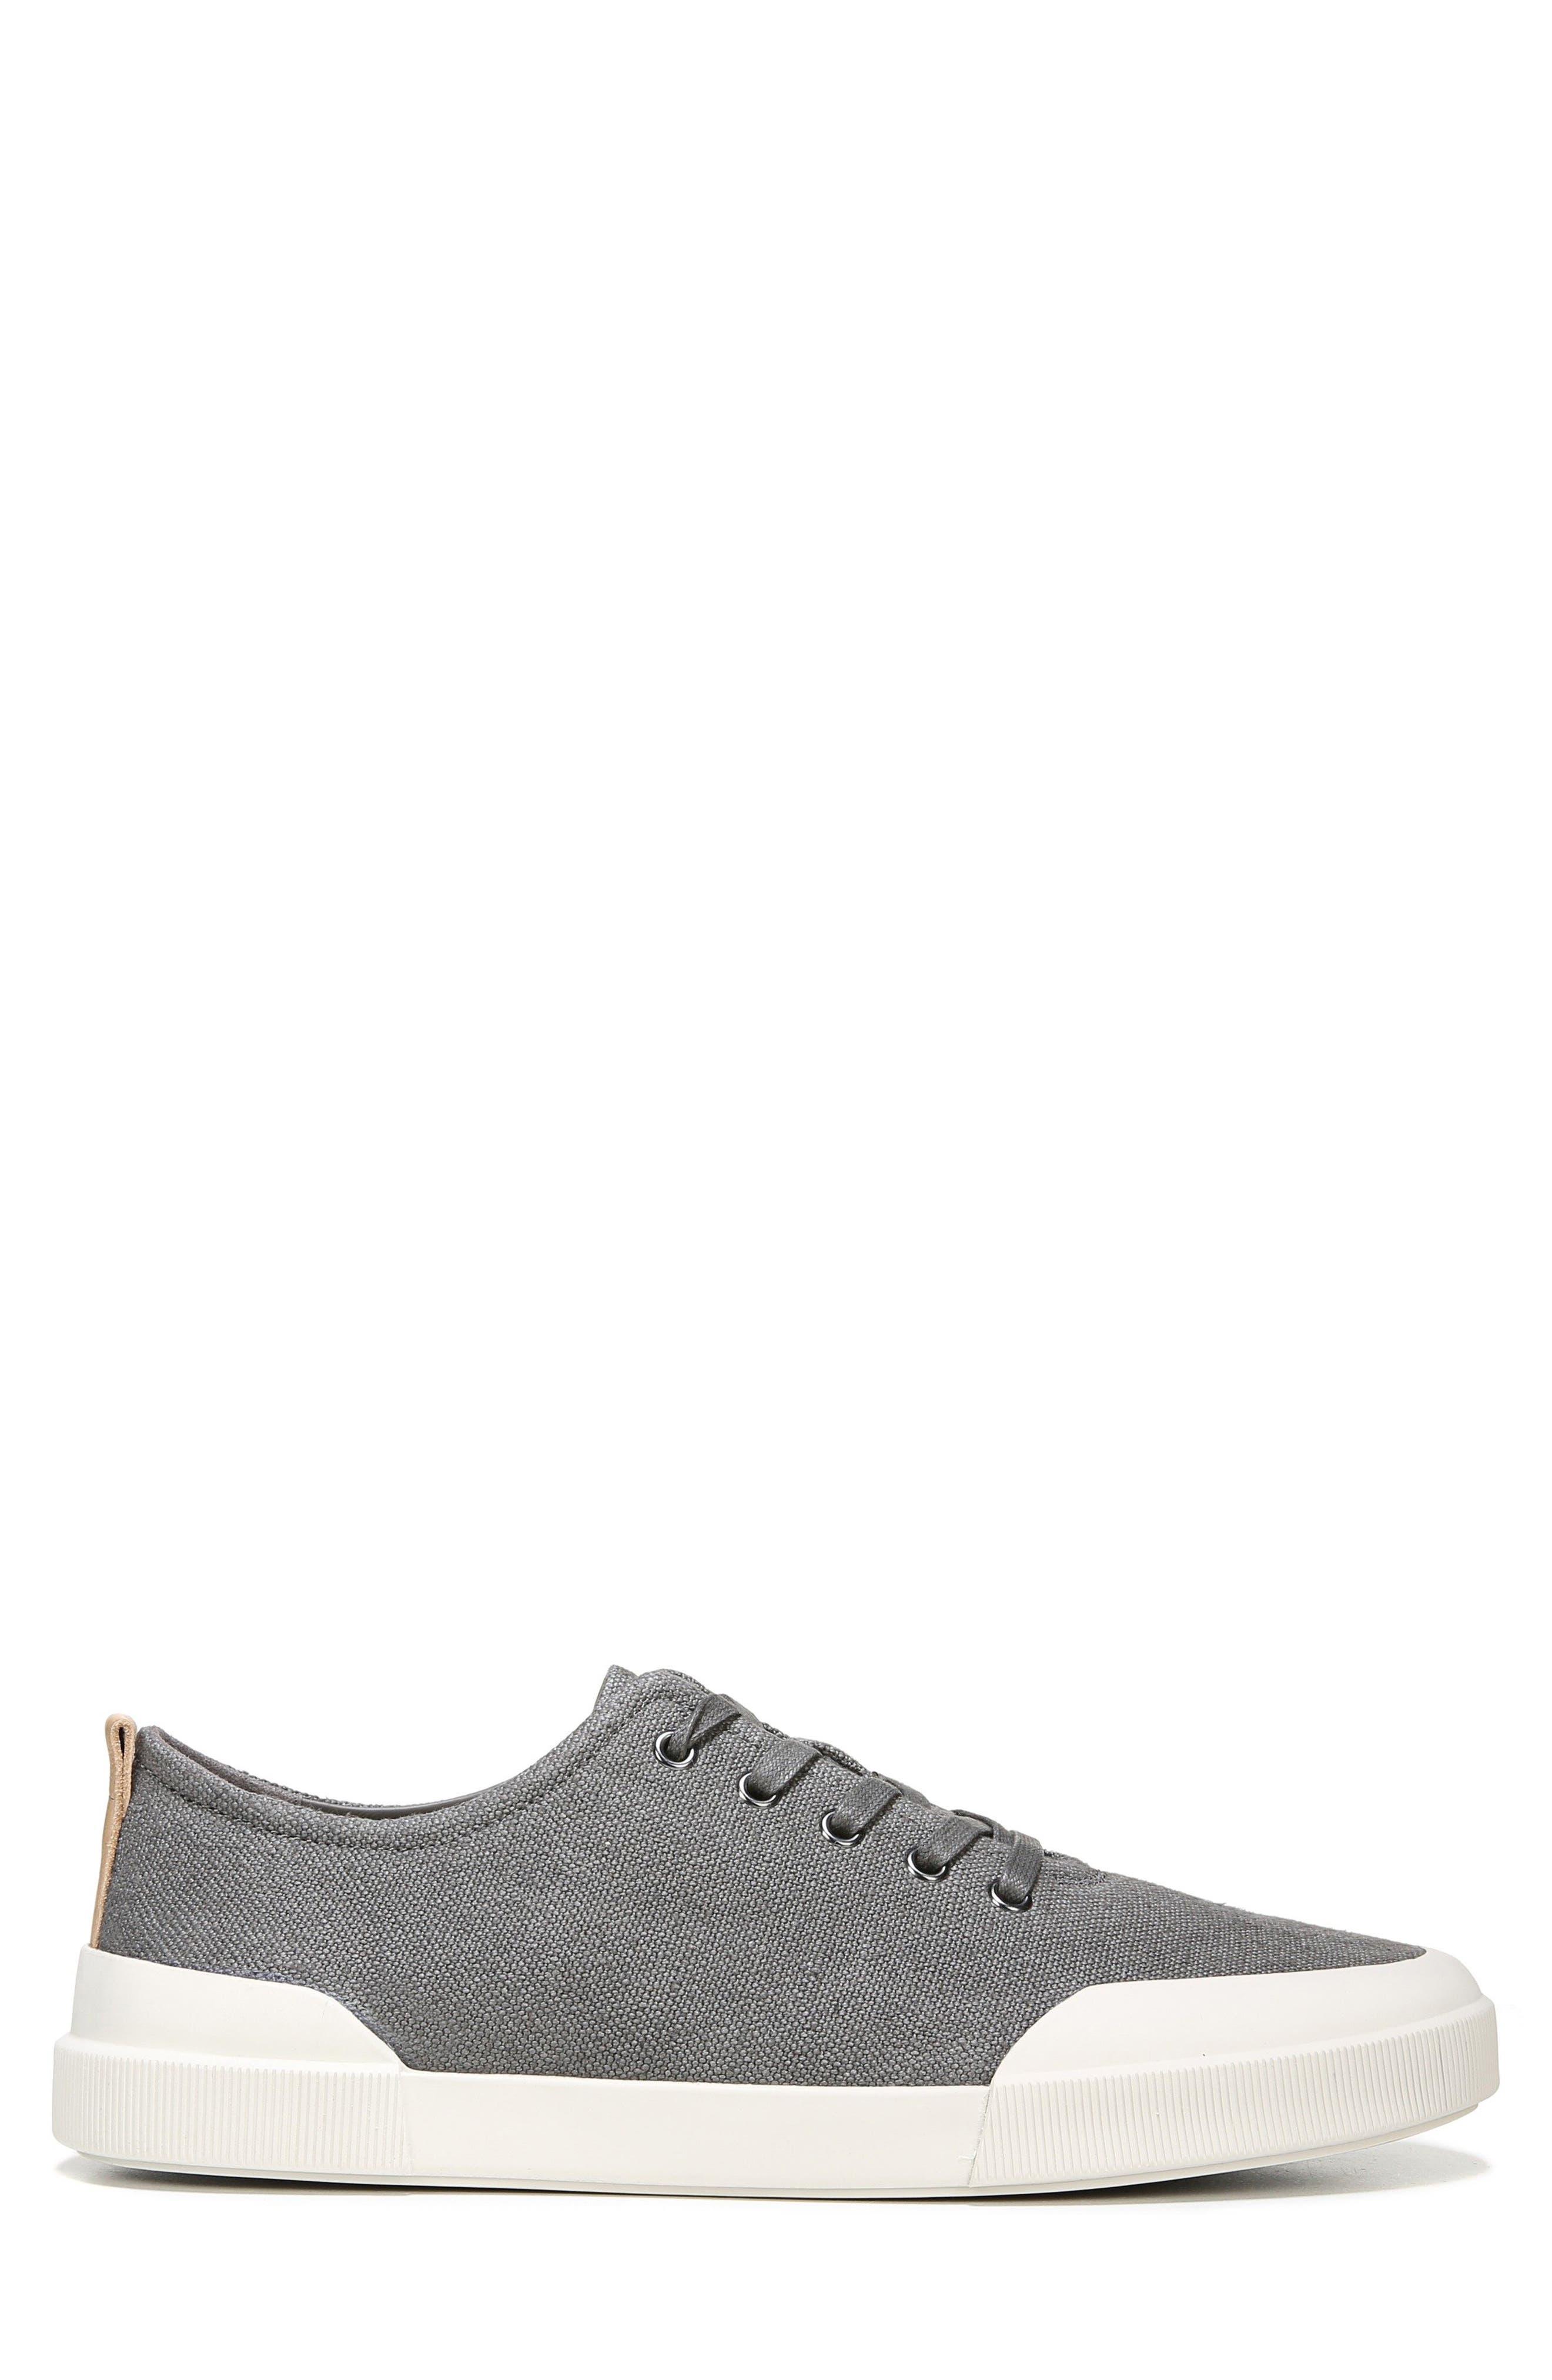 Victor Low Top Sneaker,                             Alternate thumbnail 3, color,                             020